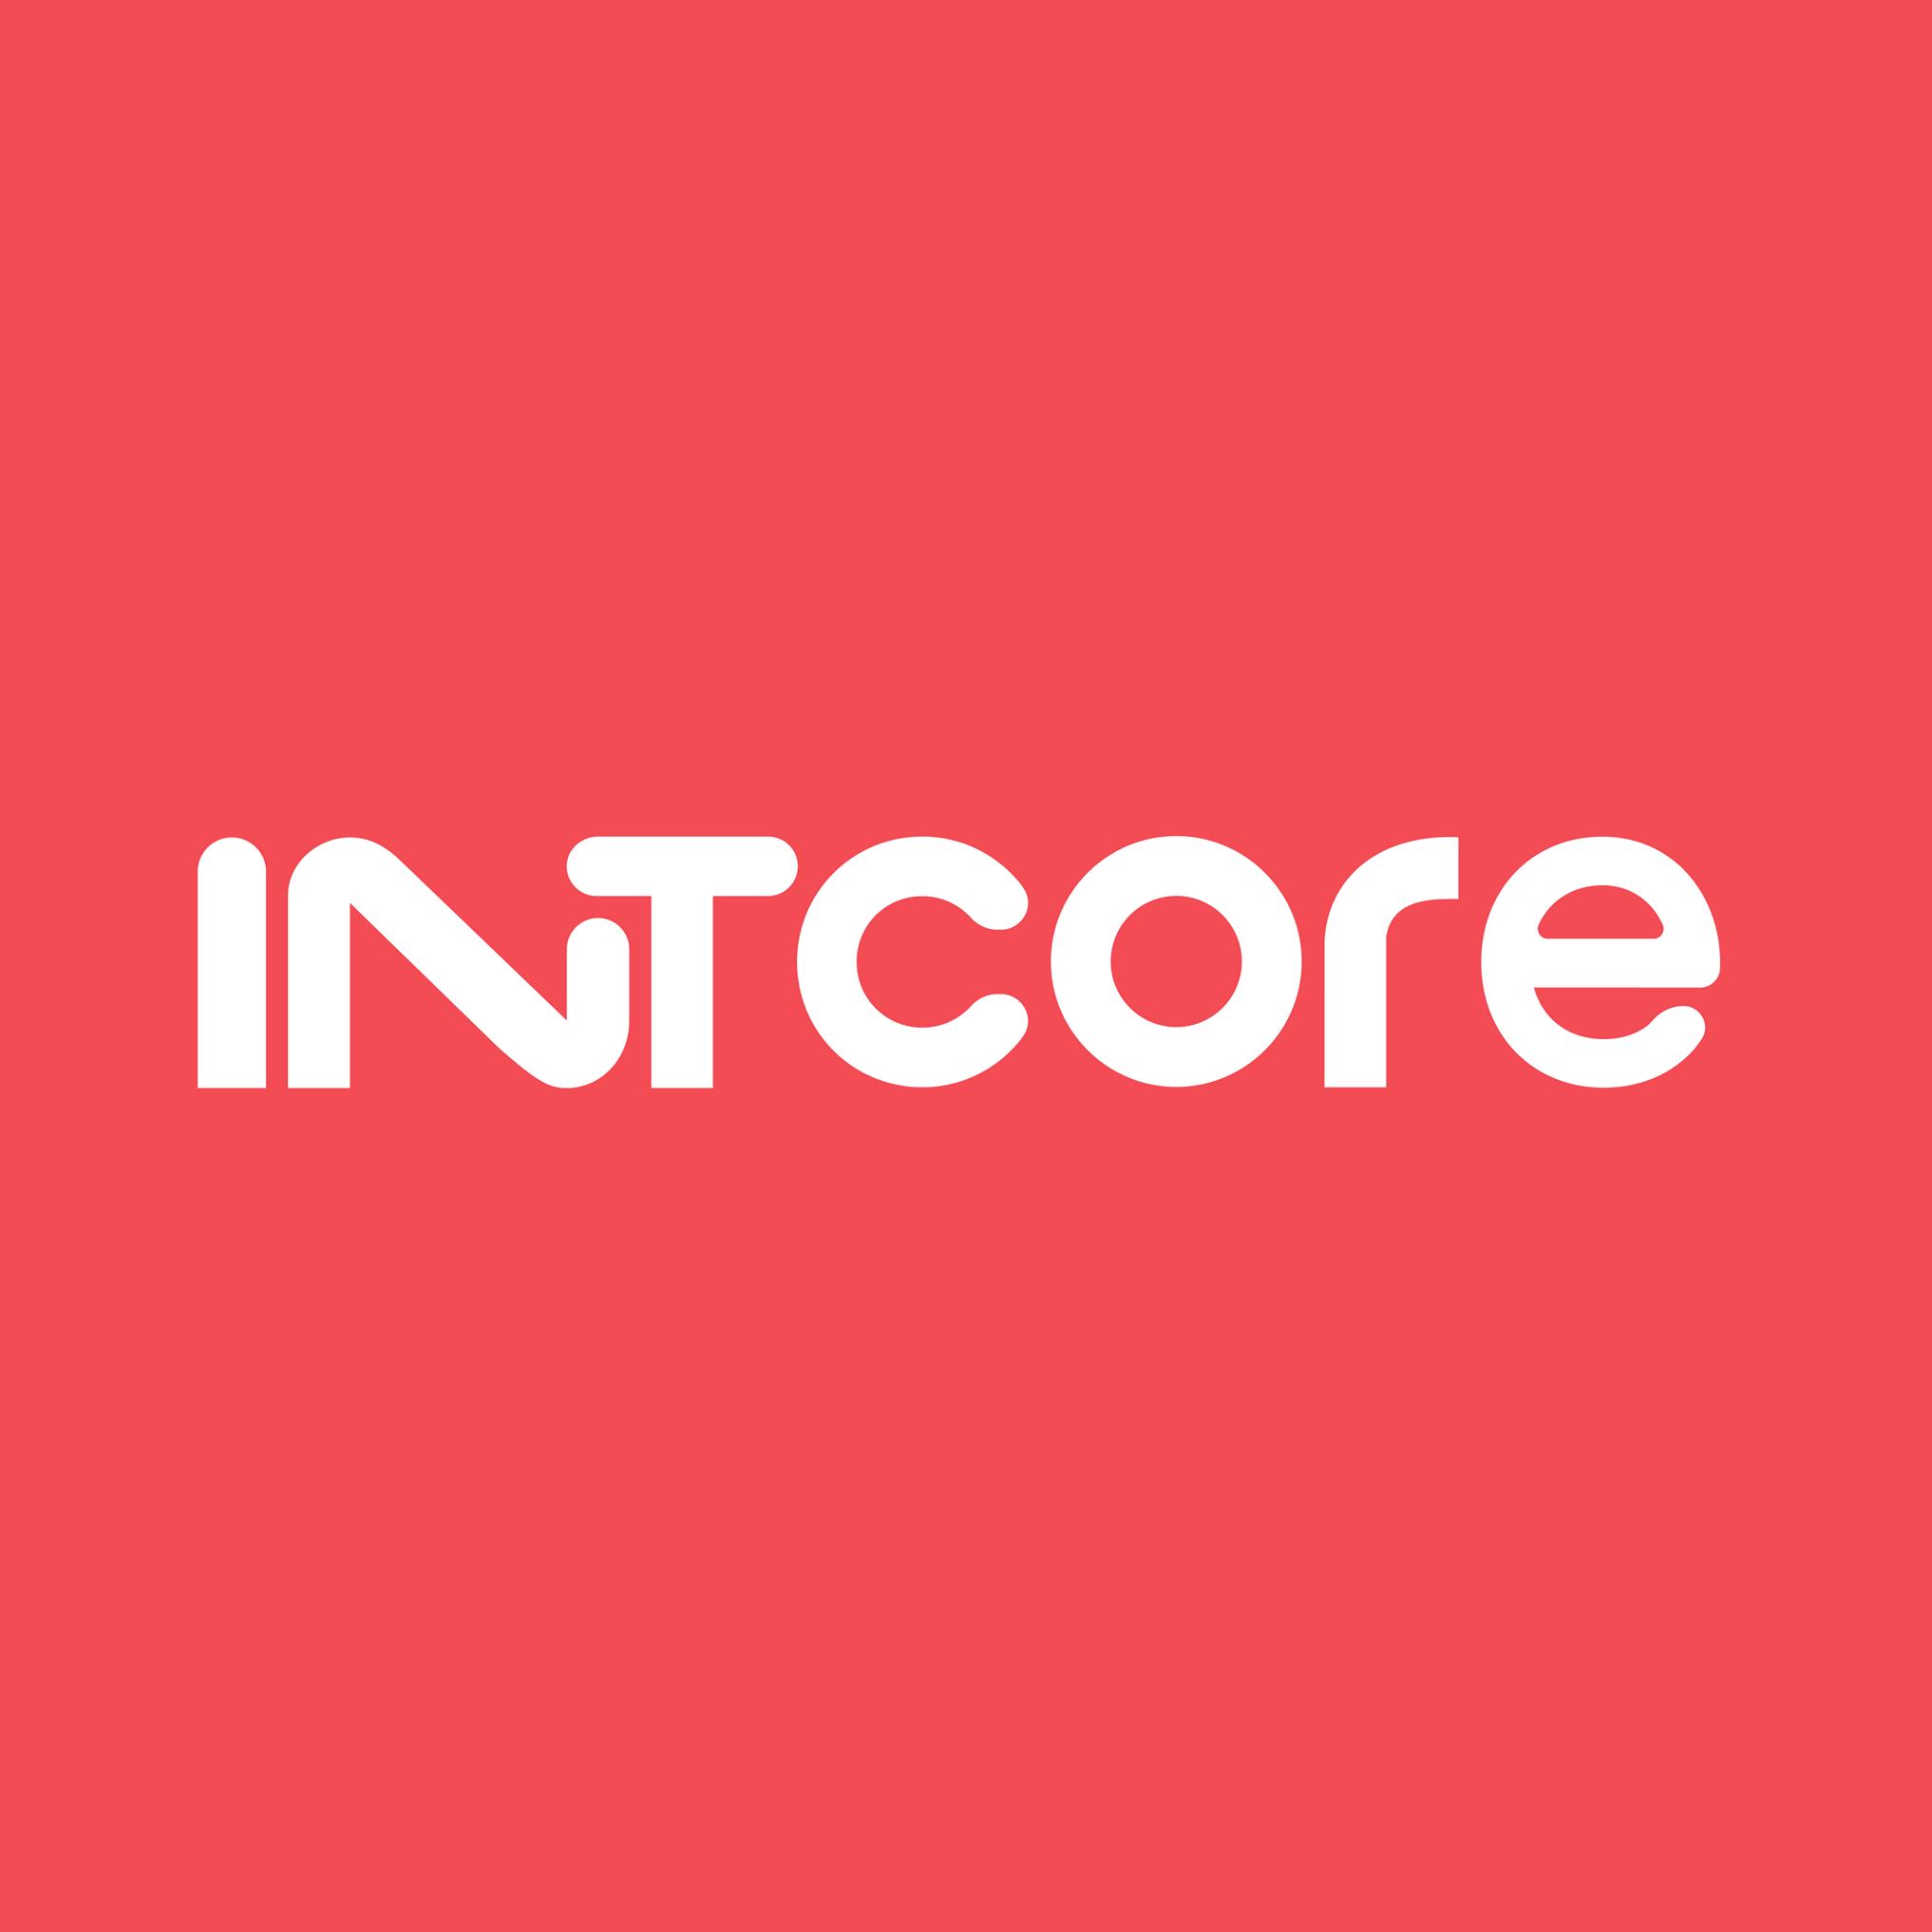 Intcore Logo